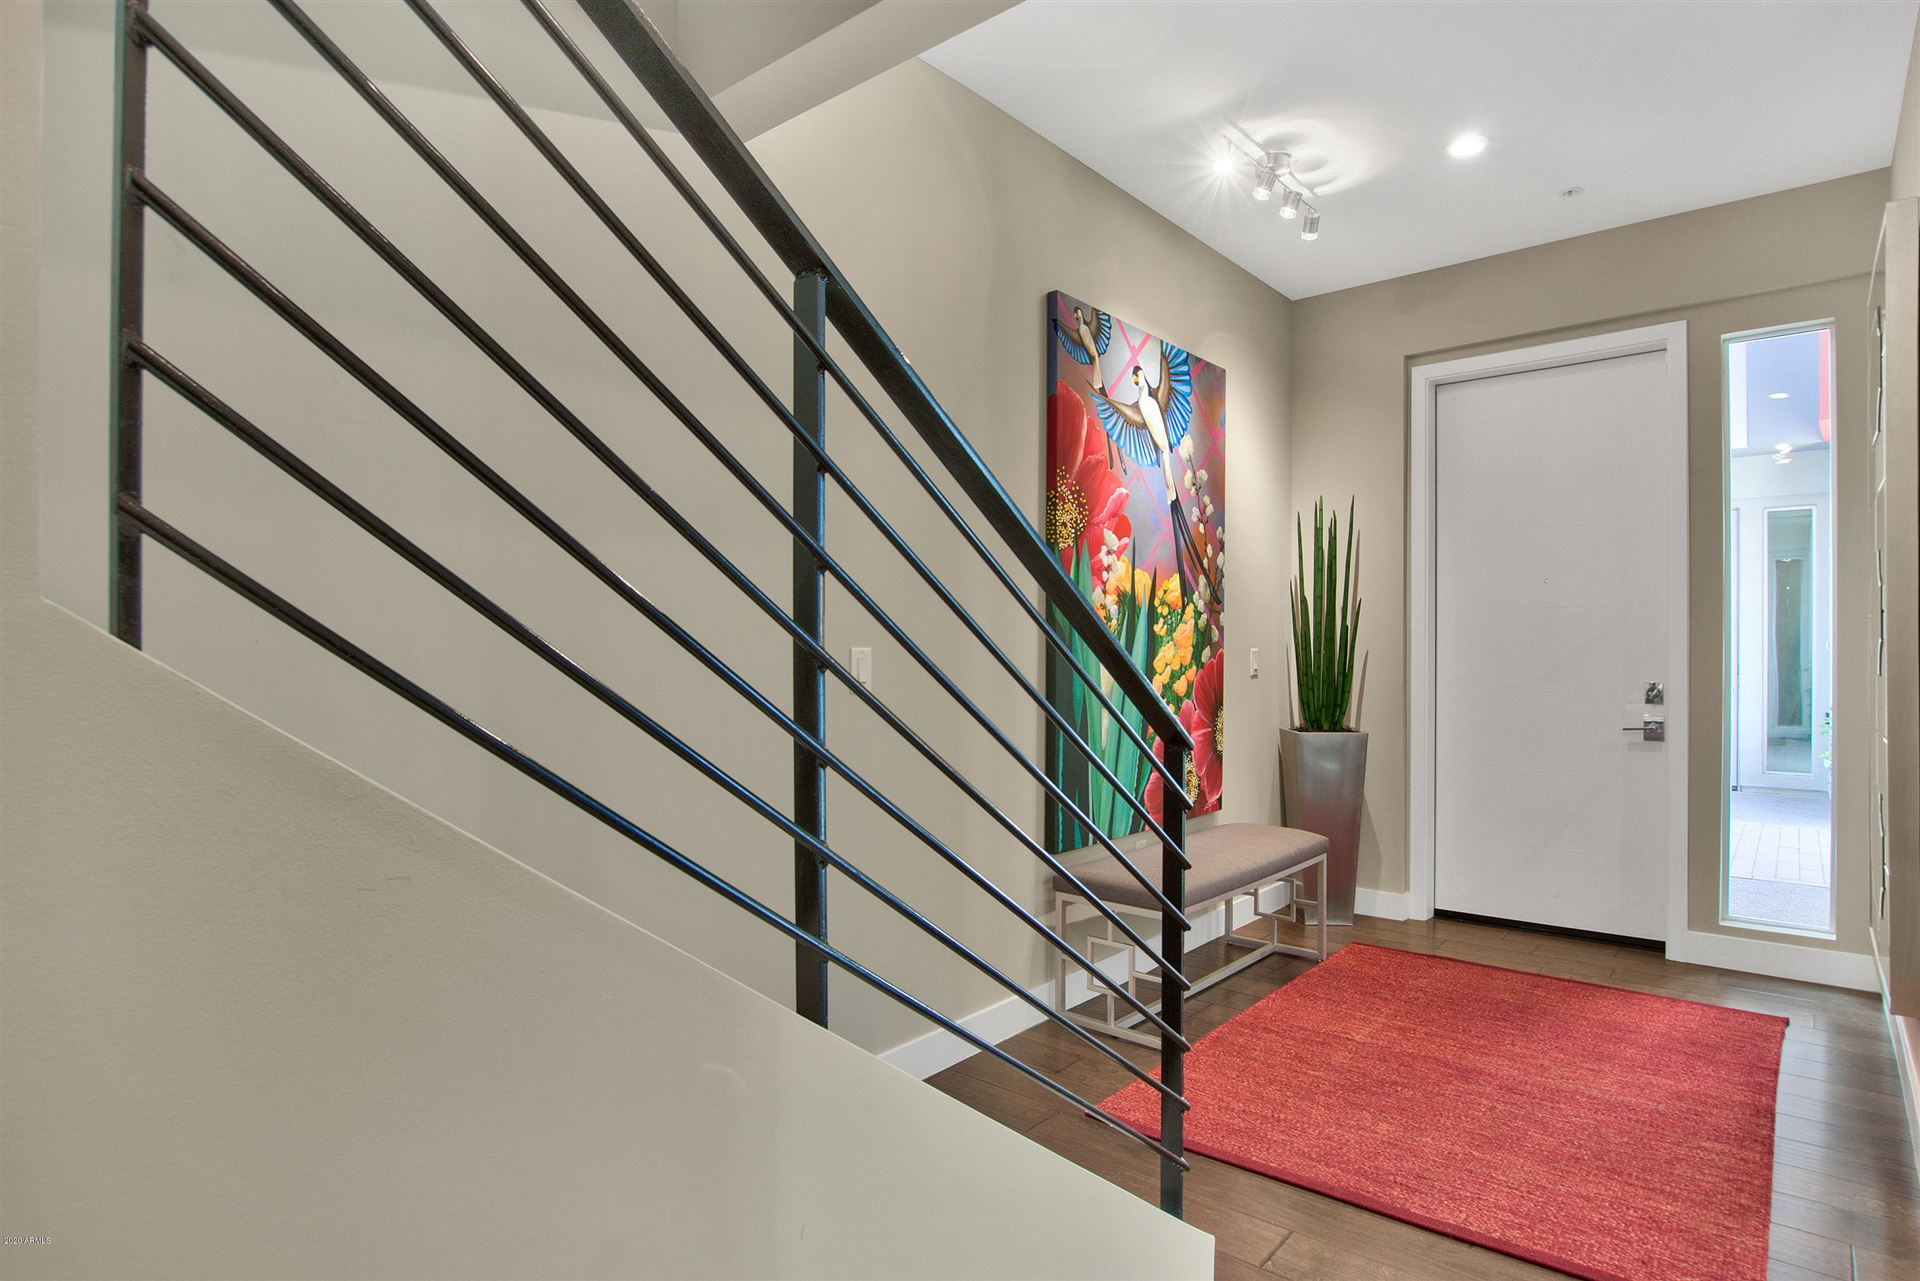 16510 N 92ND Street #1002, Scottsdale, AZ 85260 - MLS#: 6022446